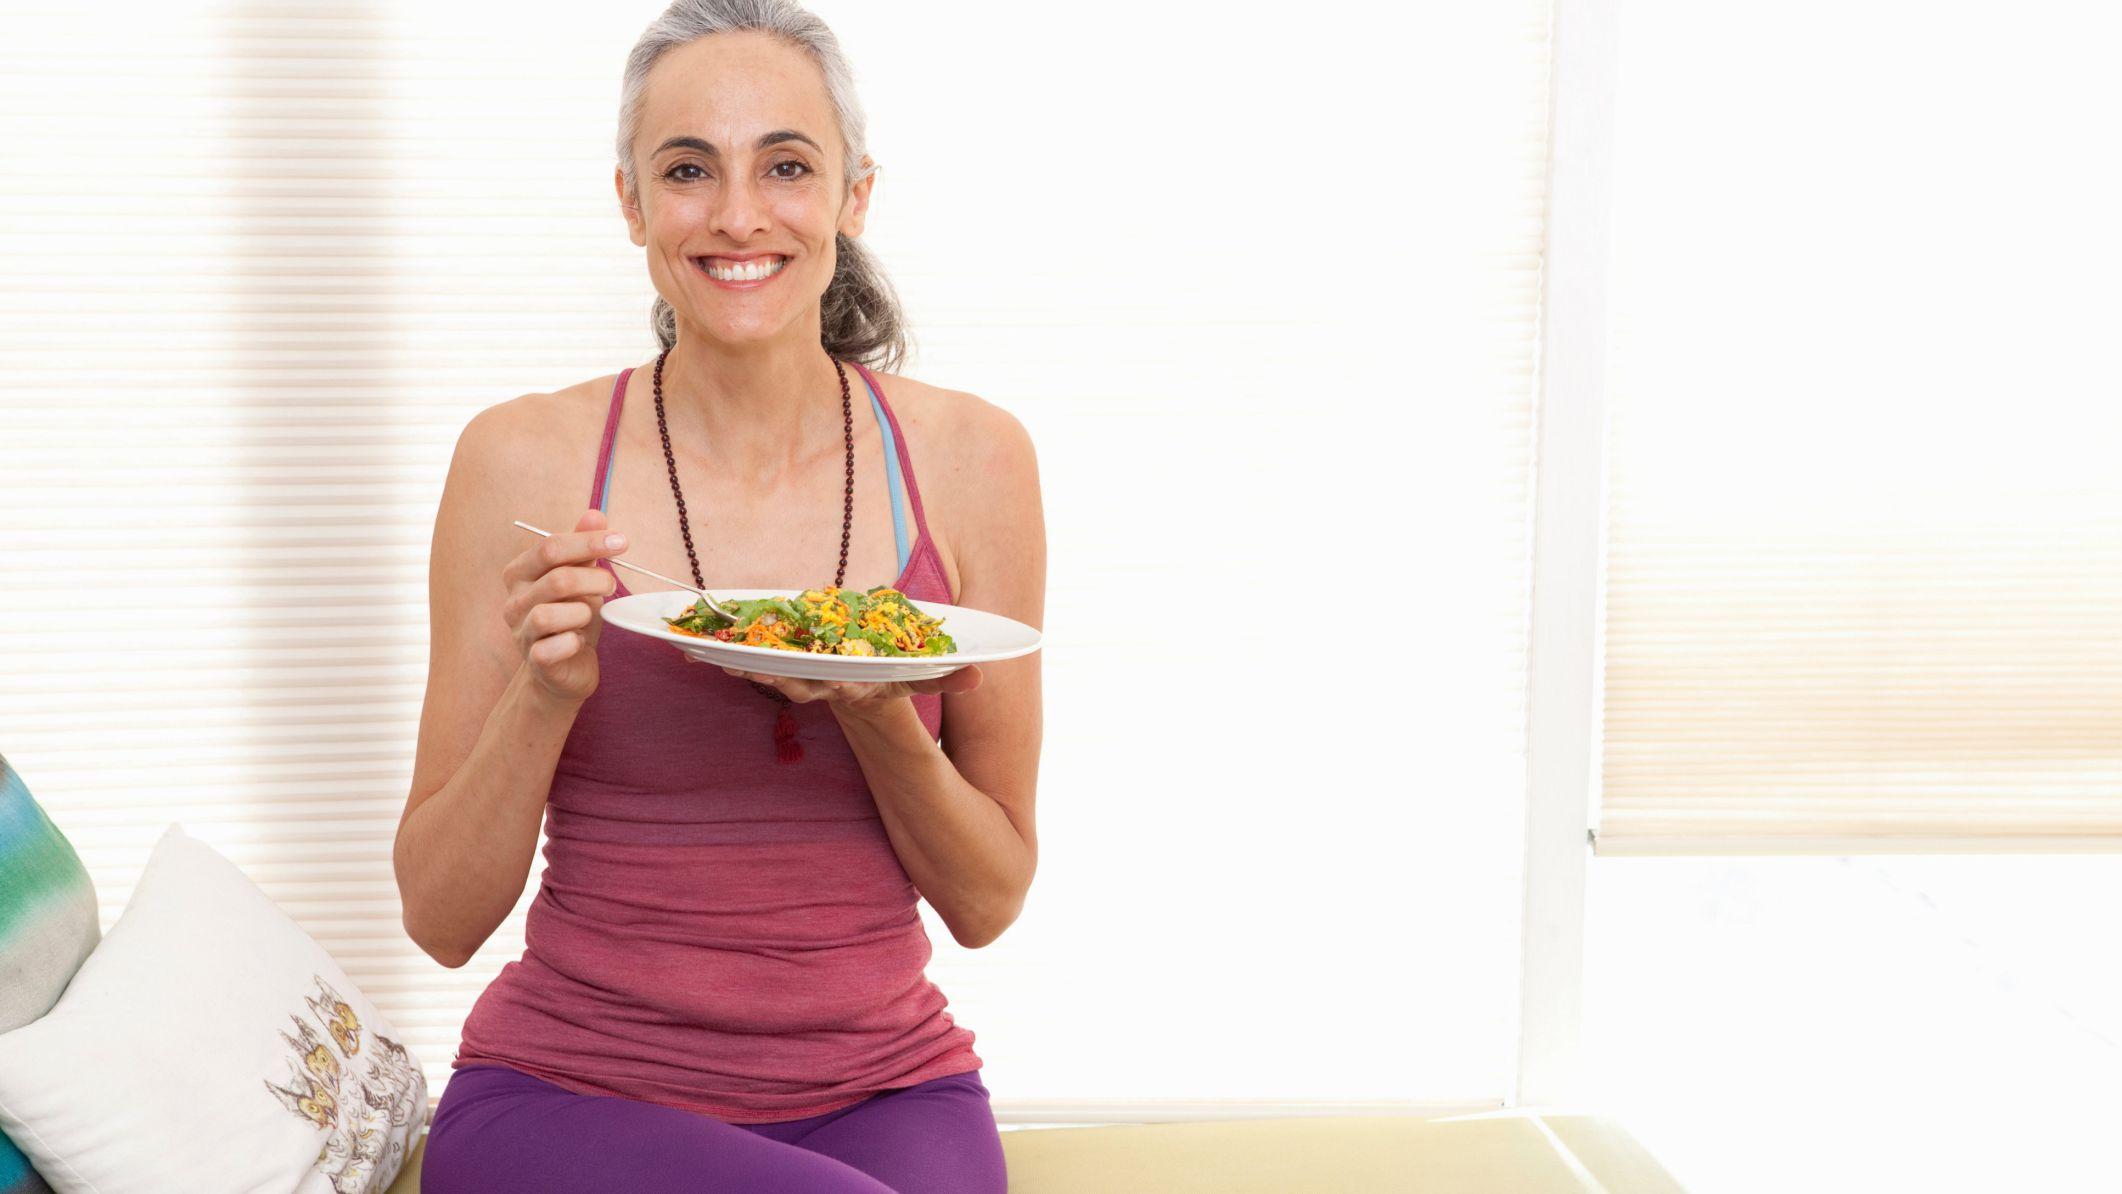 Nourishing Nutrients for Menopausal Women